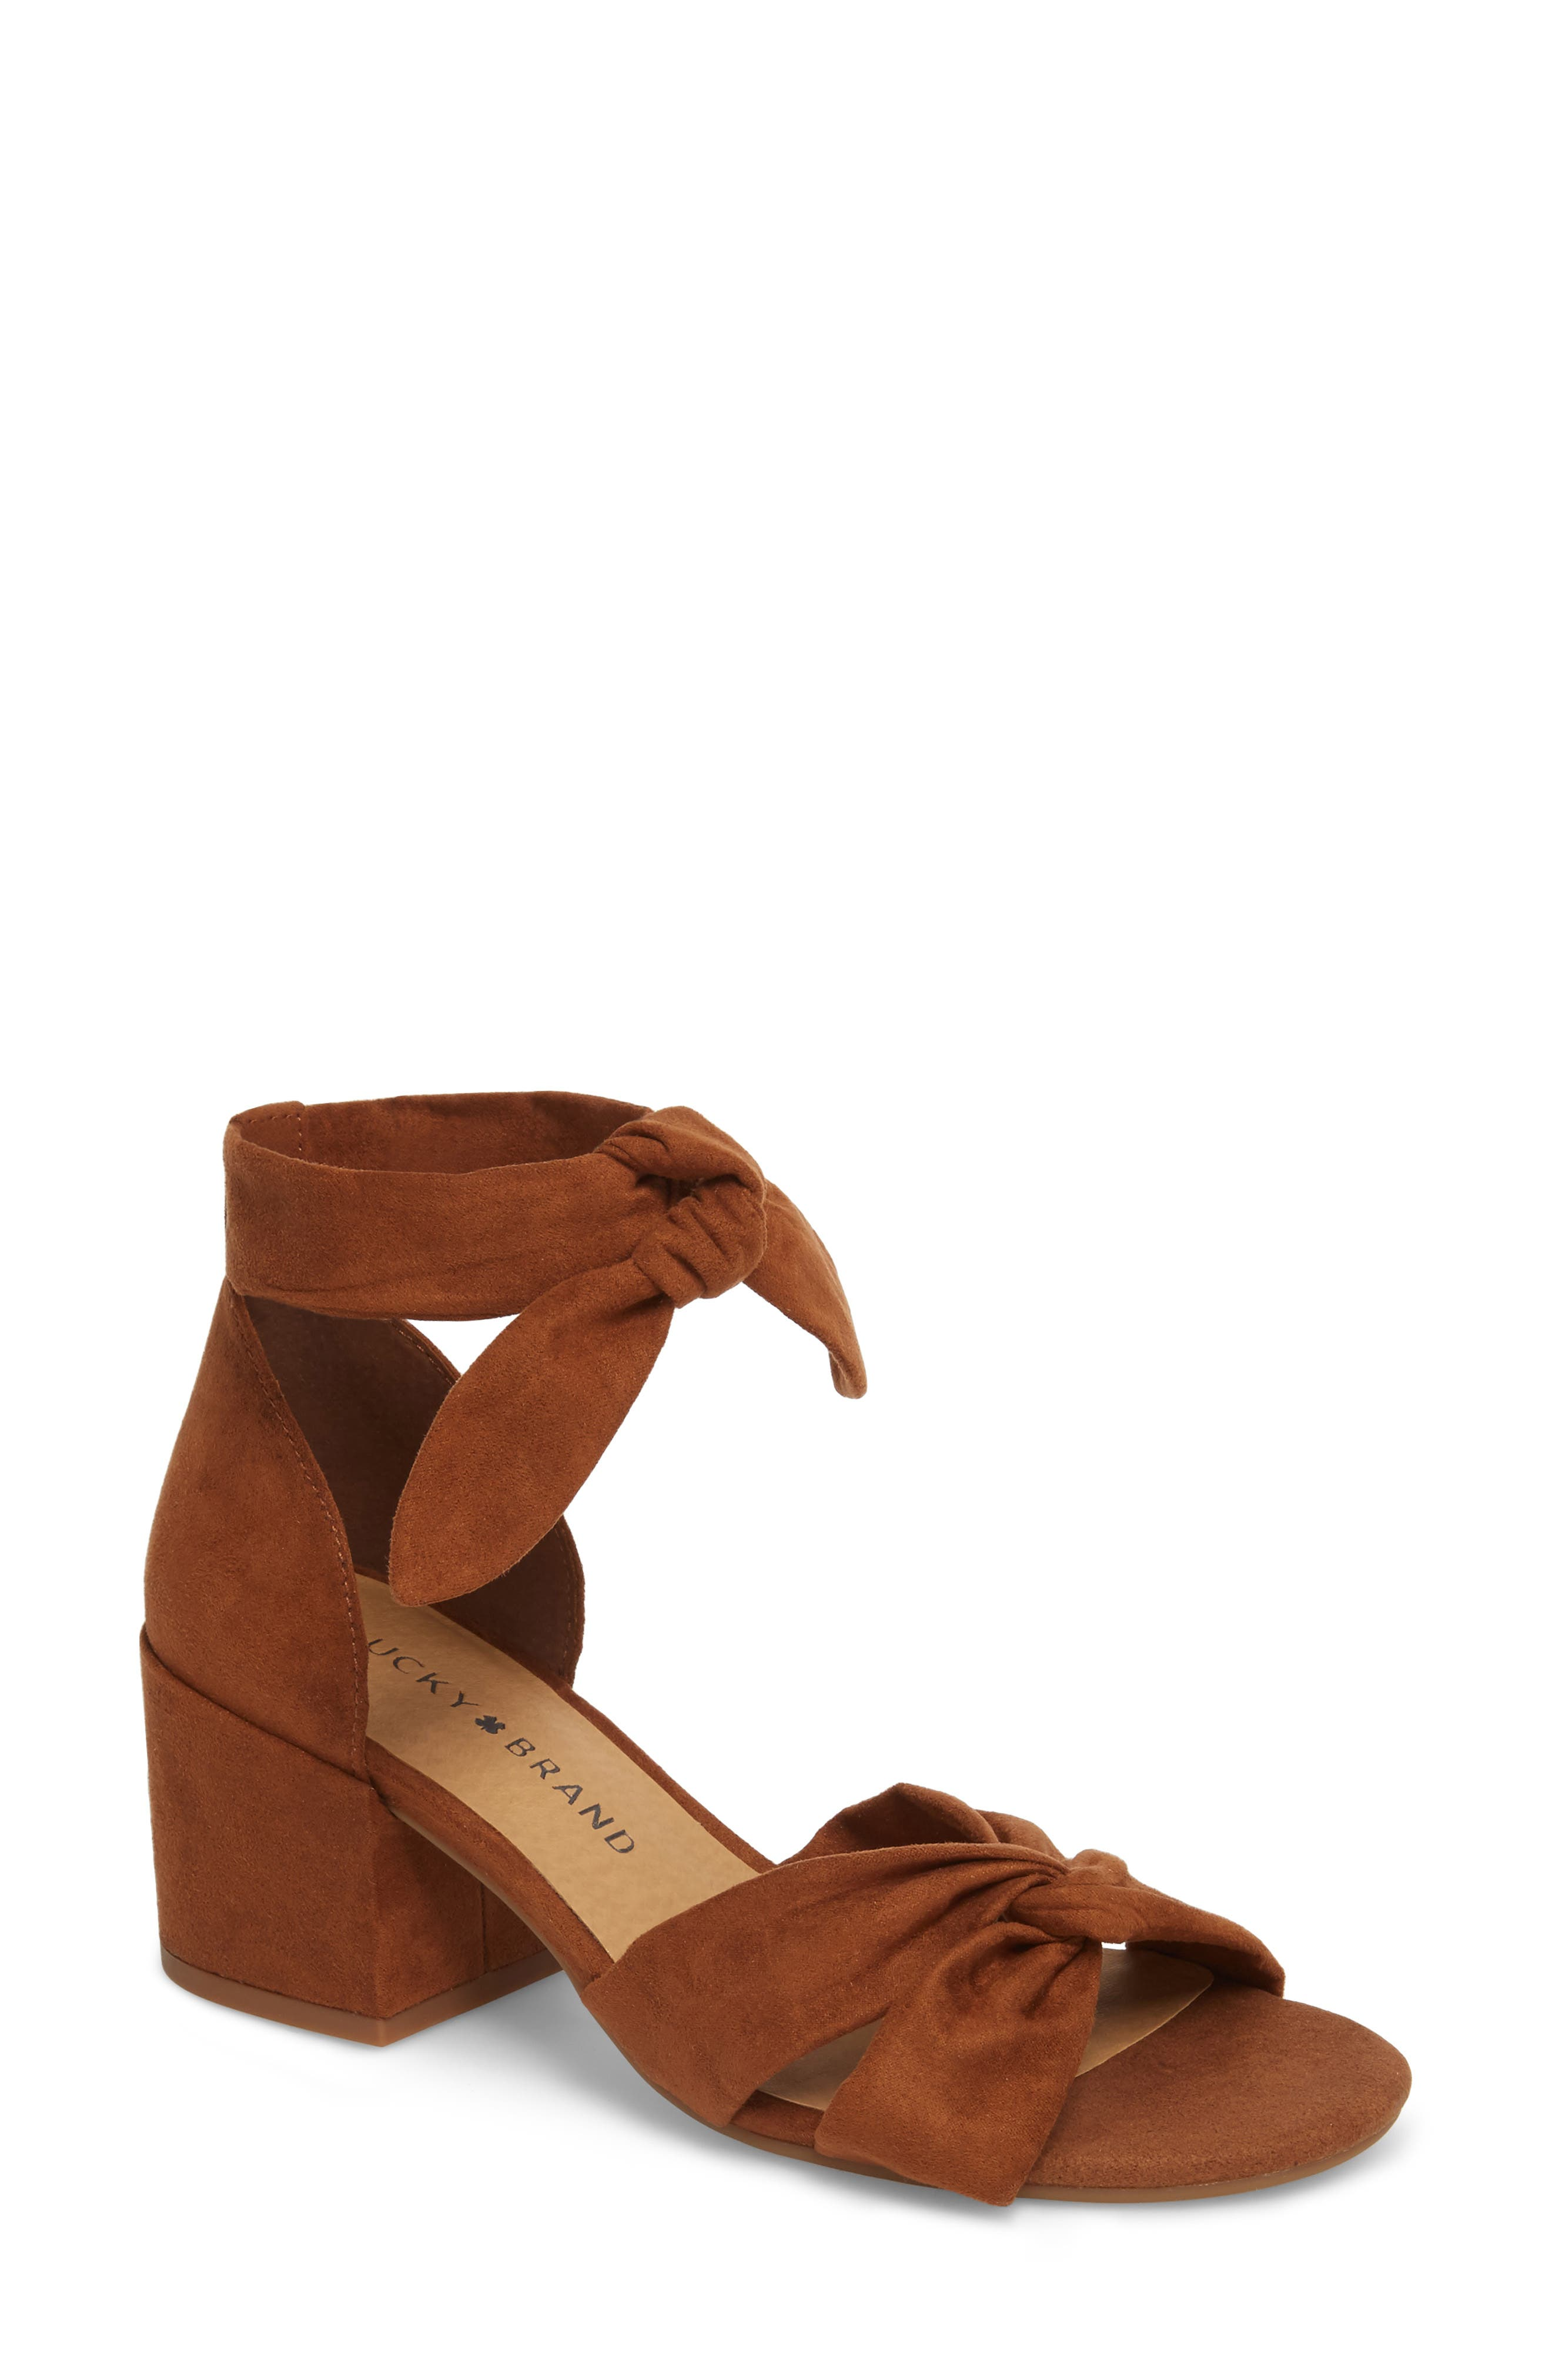 Xaylah Ankle Strap Sandal,                             Main thumbnail 3, color,